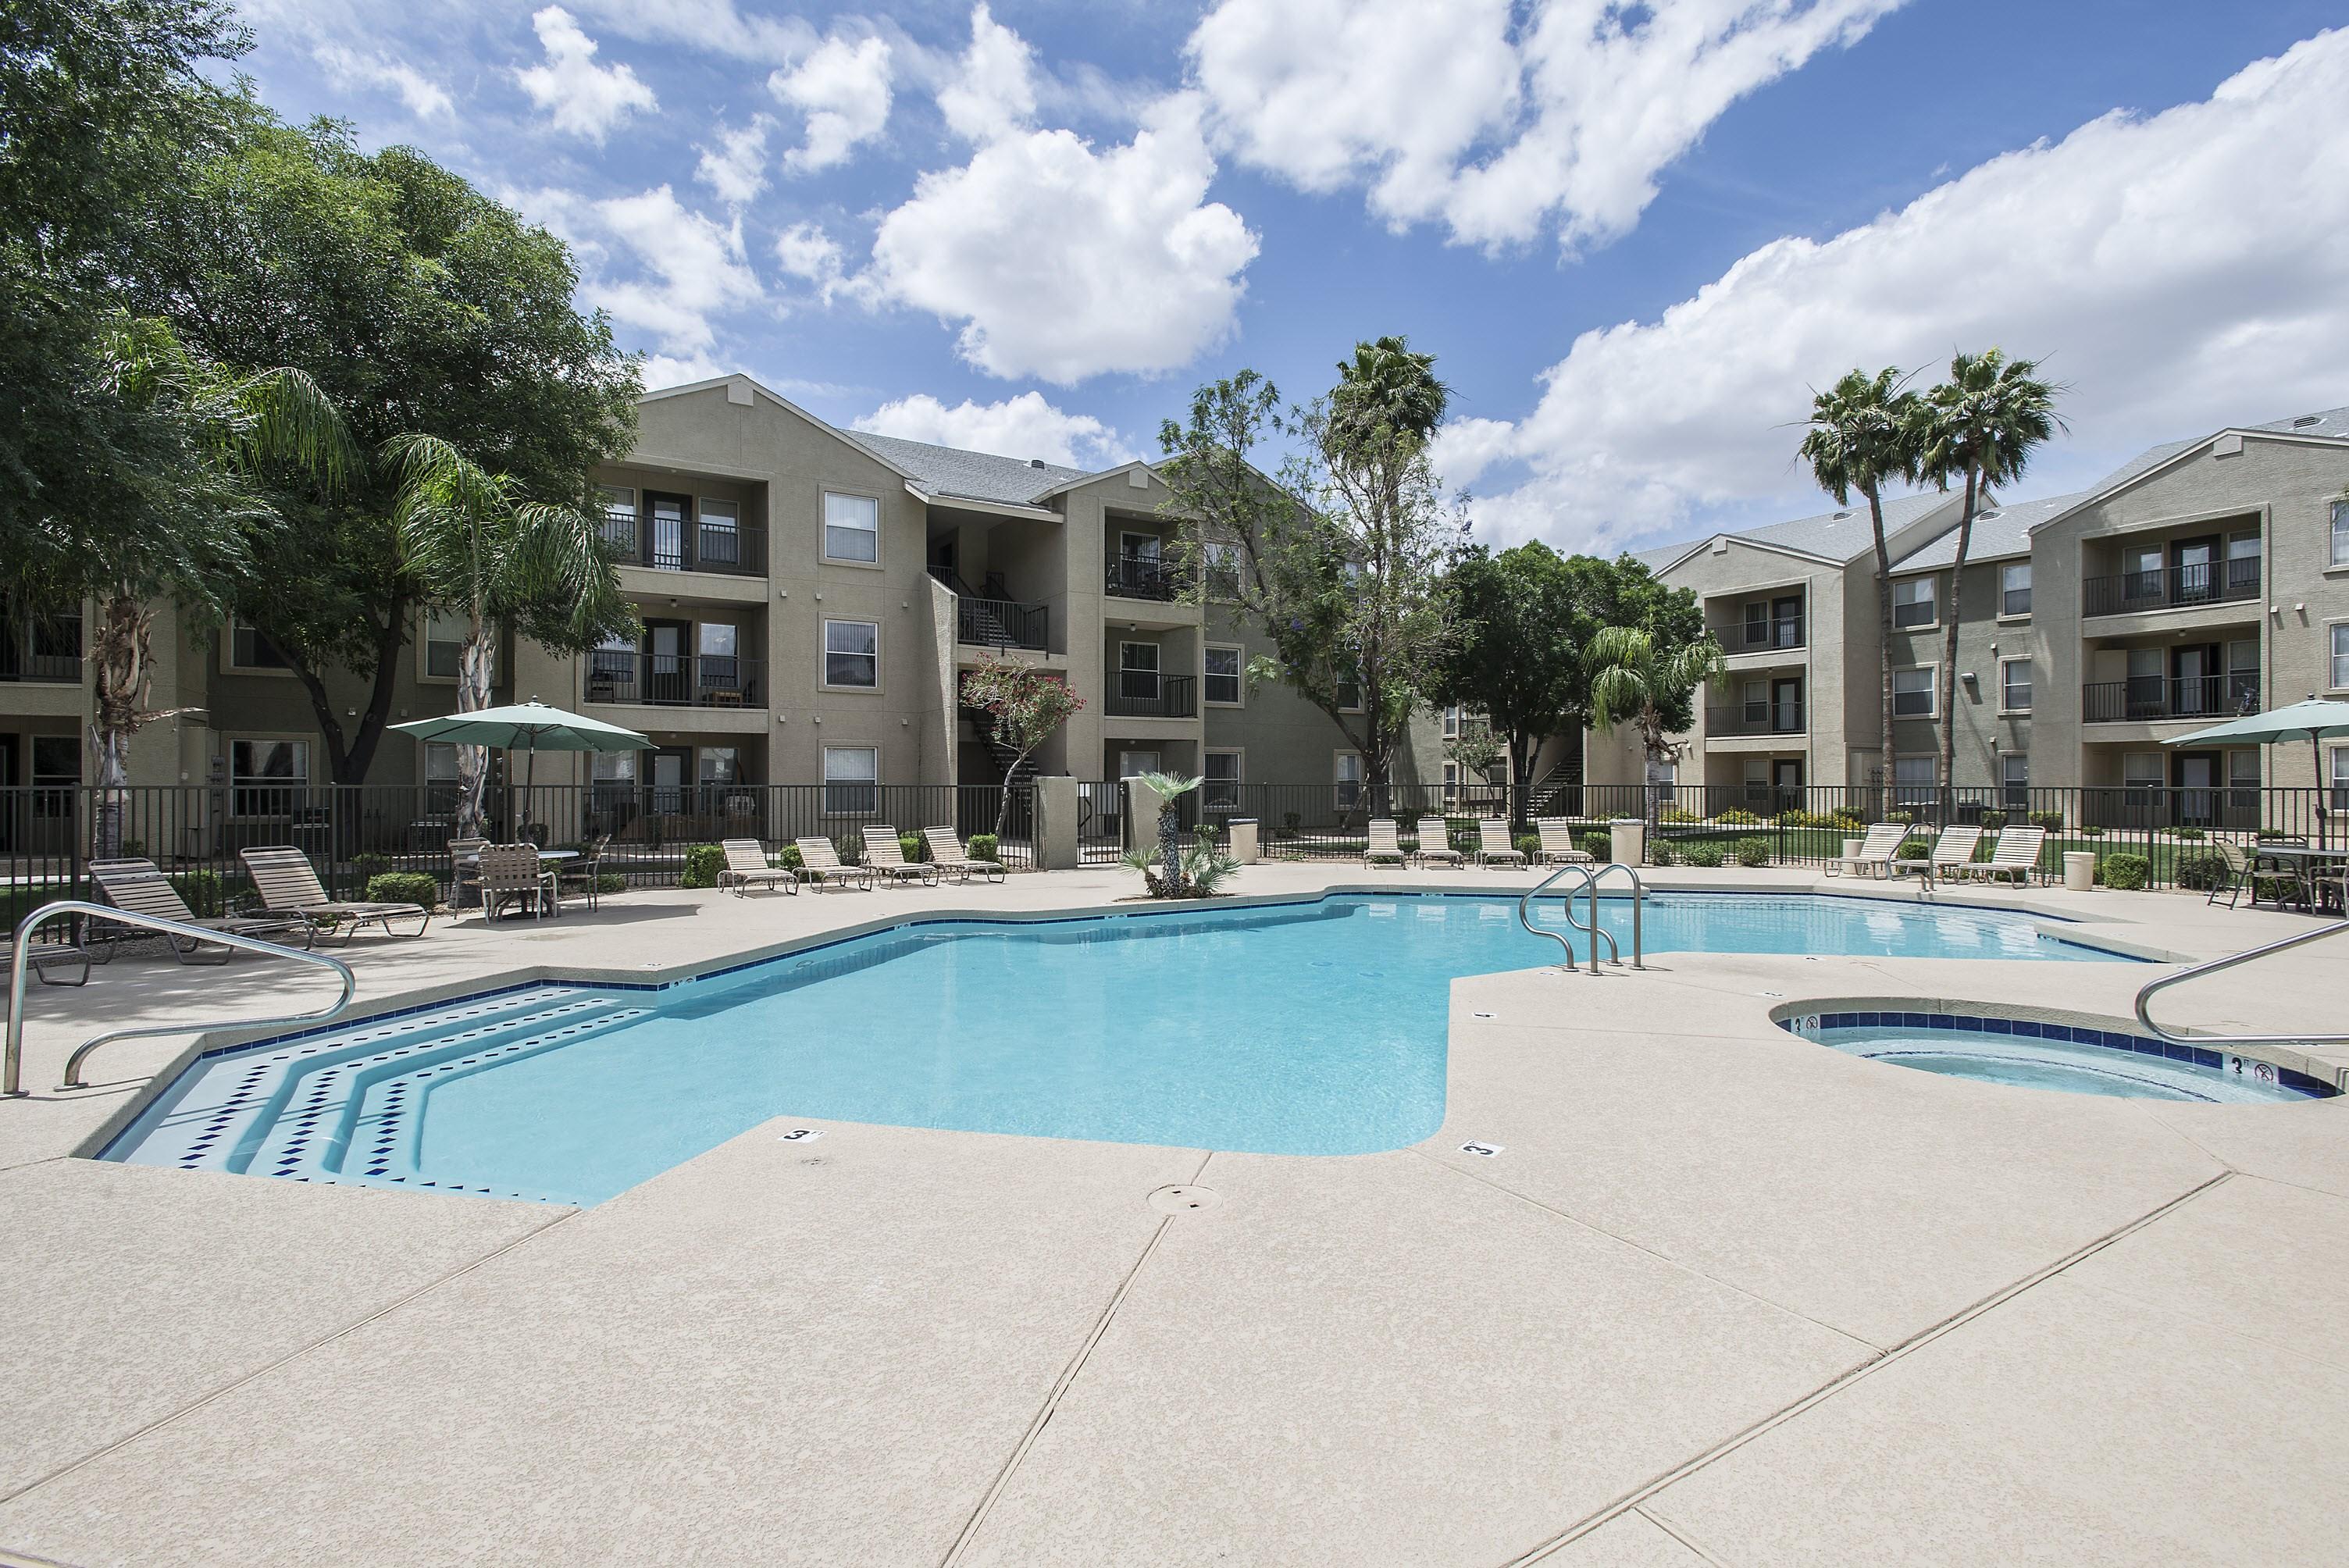 Apartment Flats To Rent In Phoenix Metro Area 1bhk 2bhk 3bhk 4bhk Rentals Sulekha Rentals